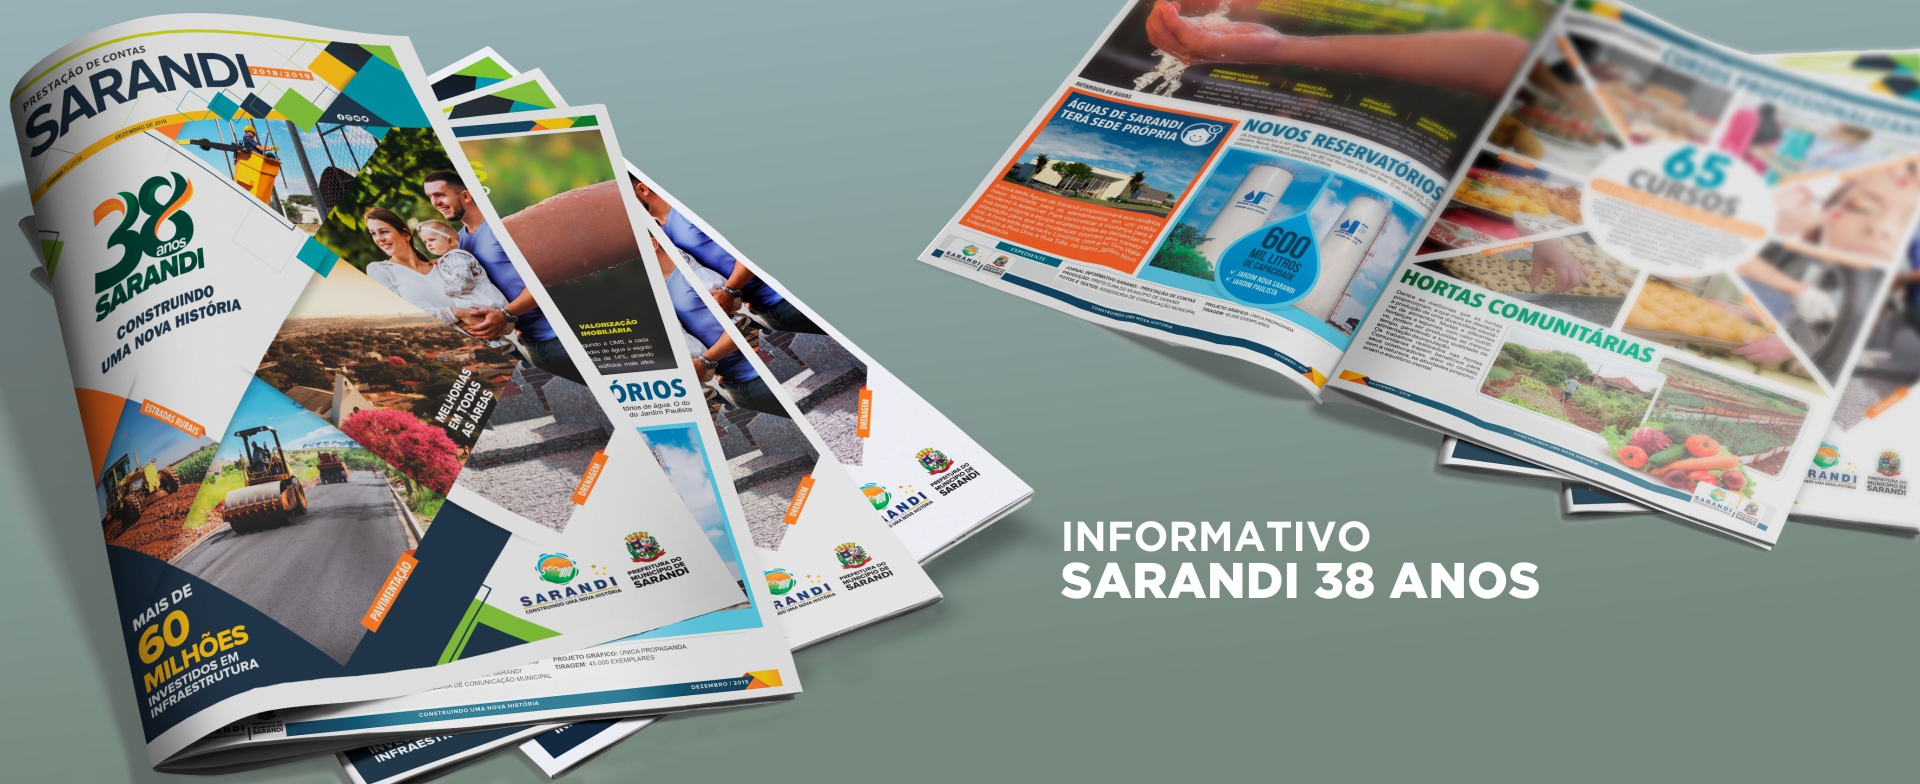 Informativo 38 anos Sarandi